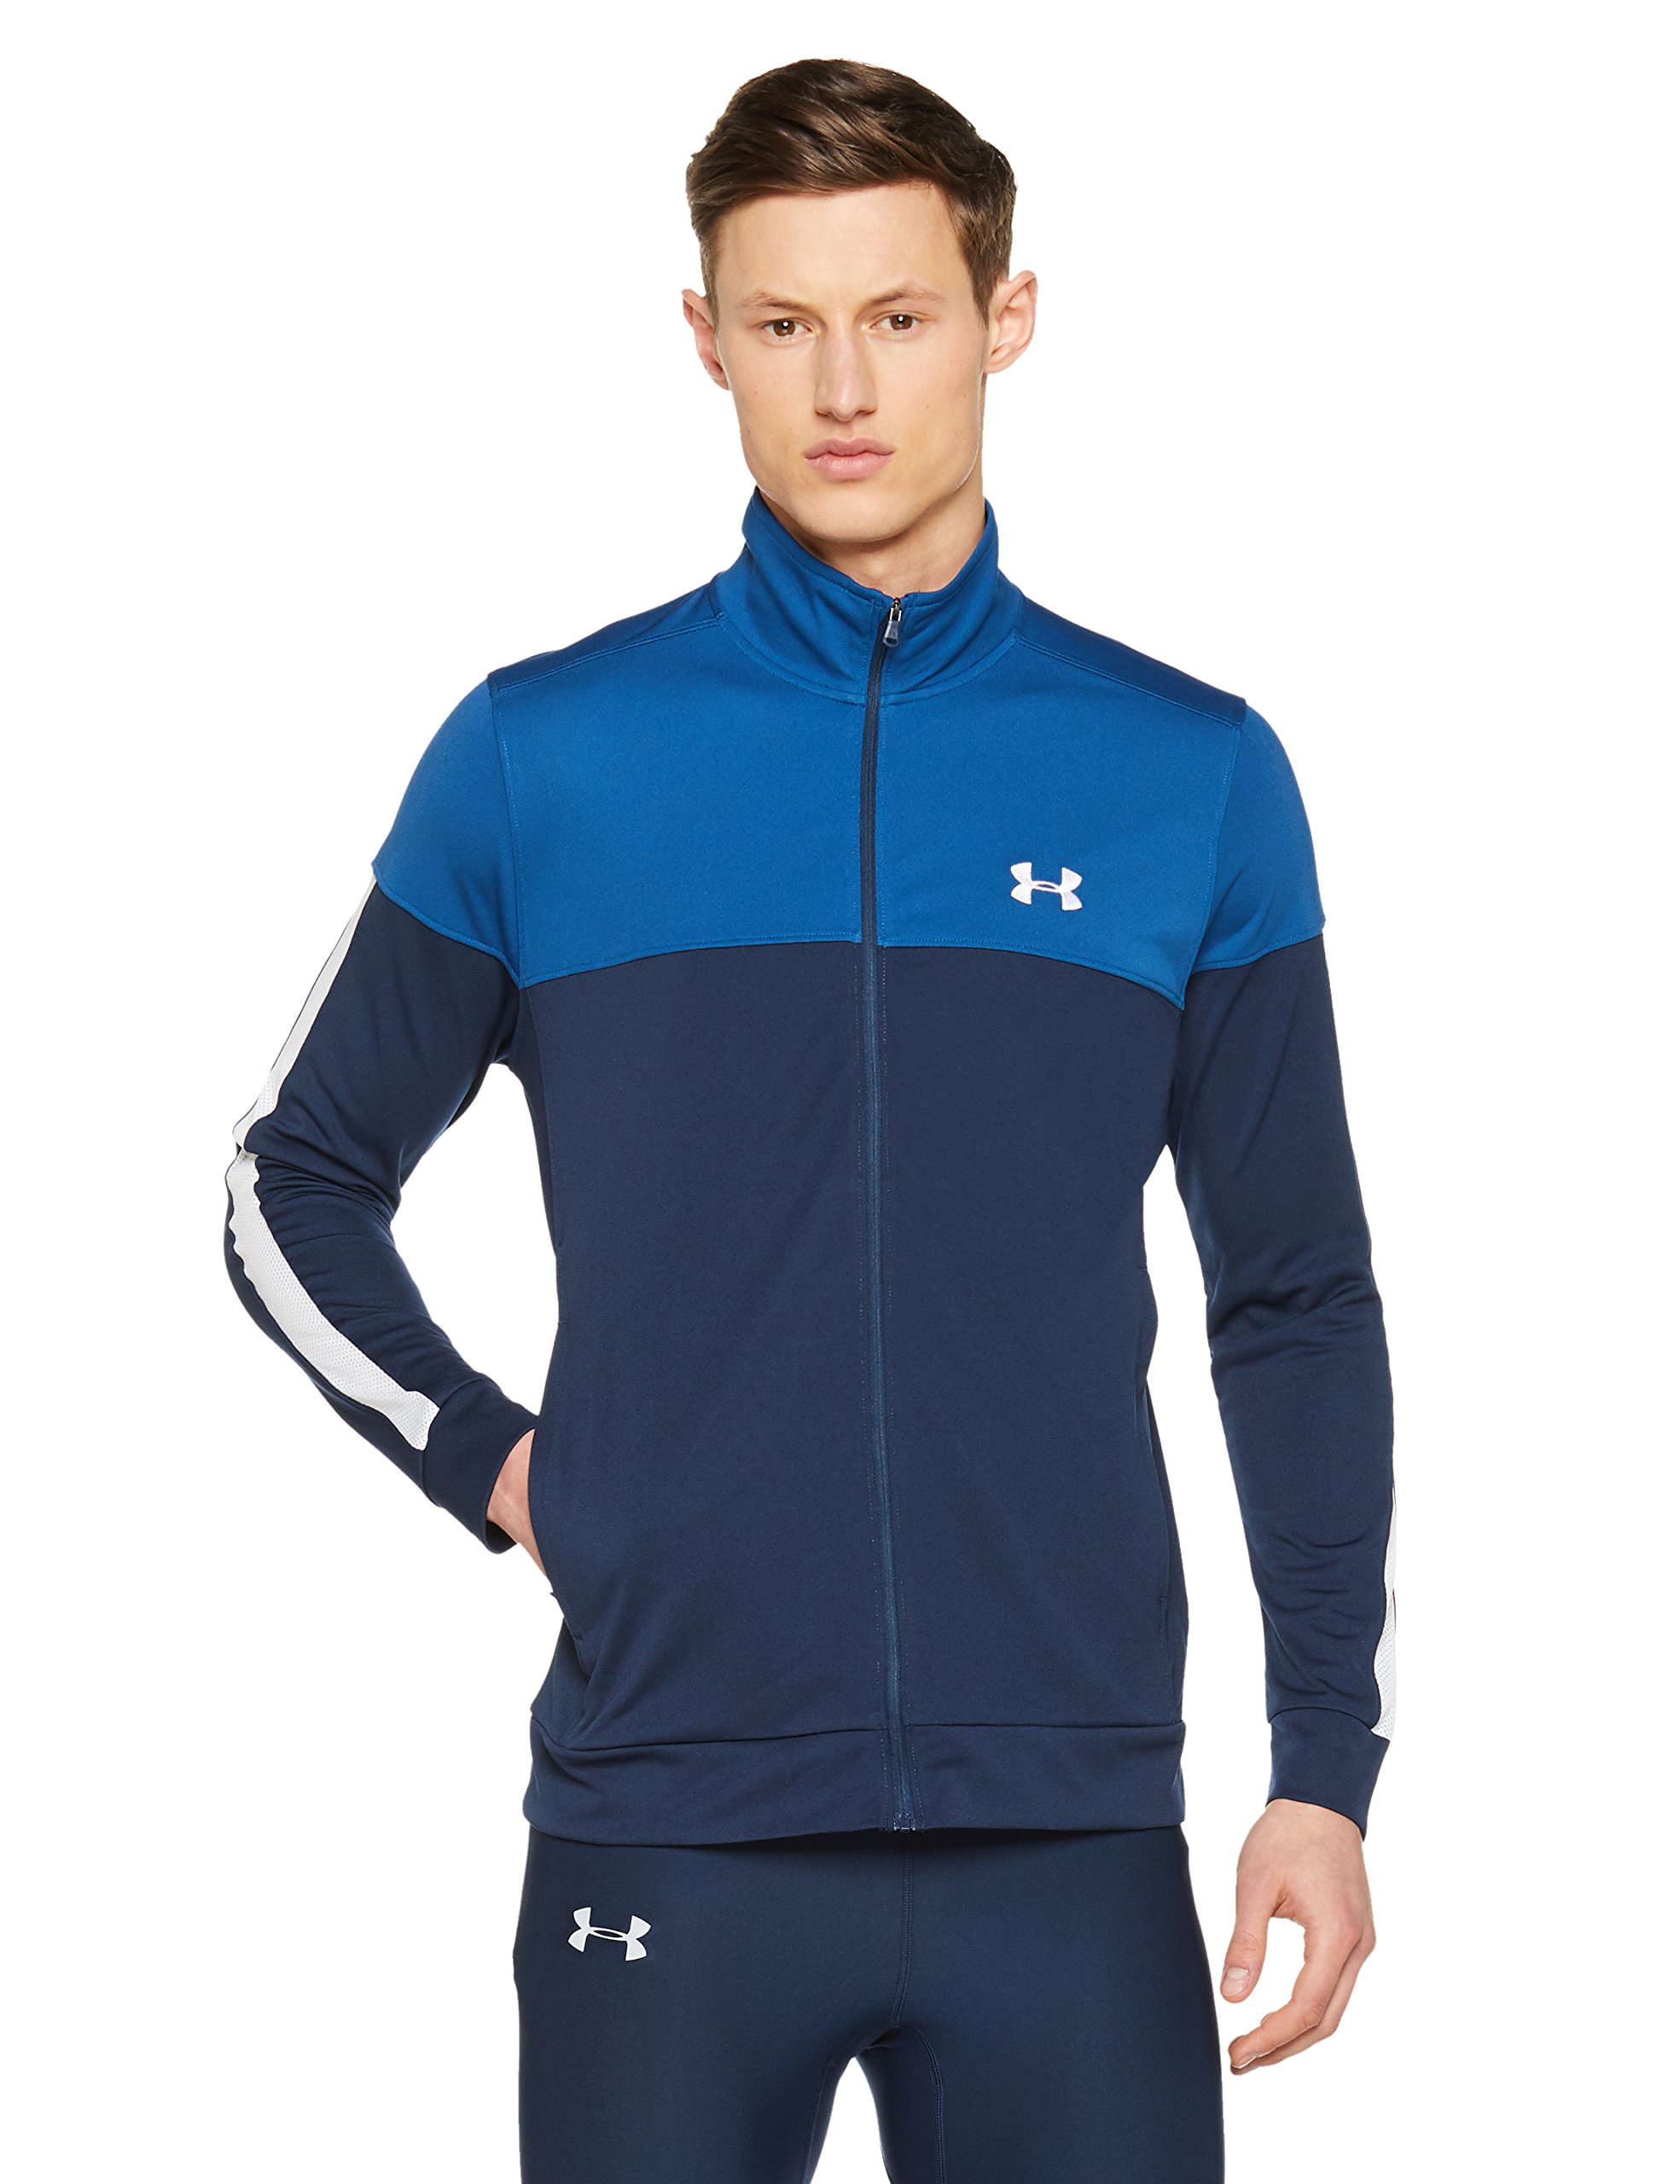 Under Armour Men's Sportstyle Pique Jacket, Academy (408)/White, Medium